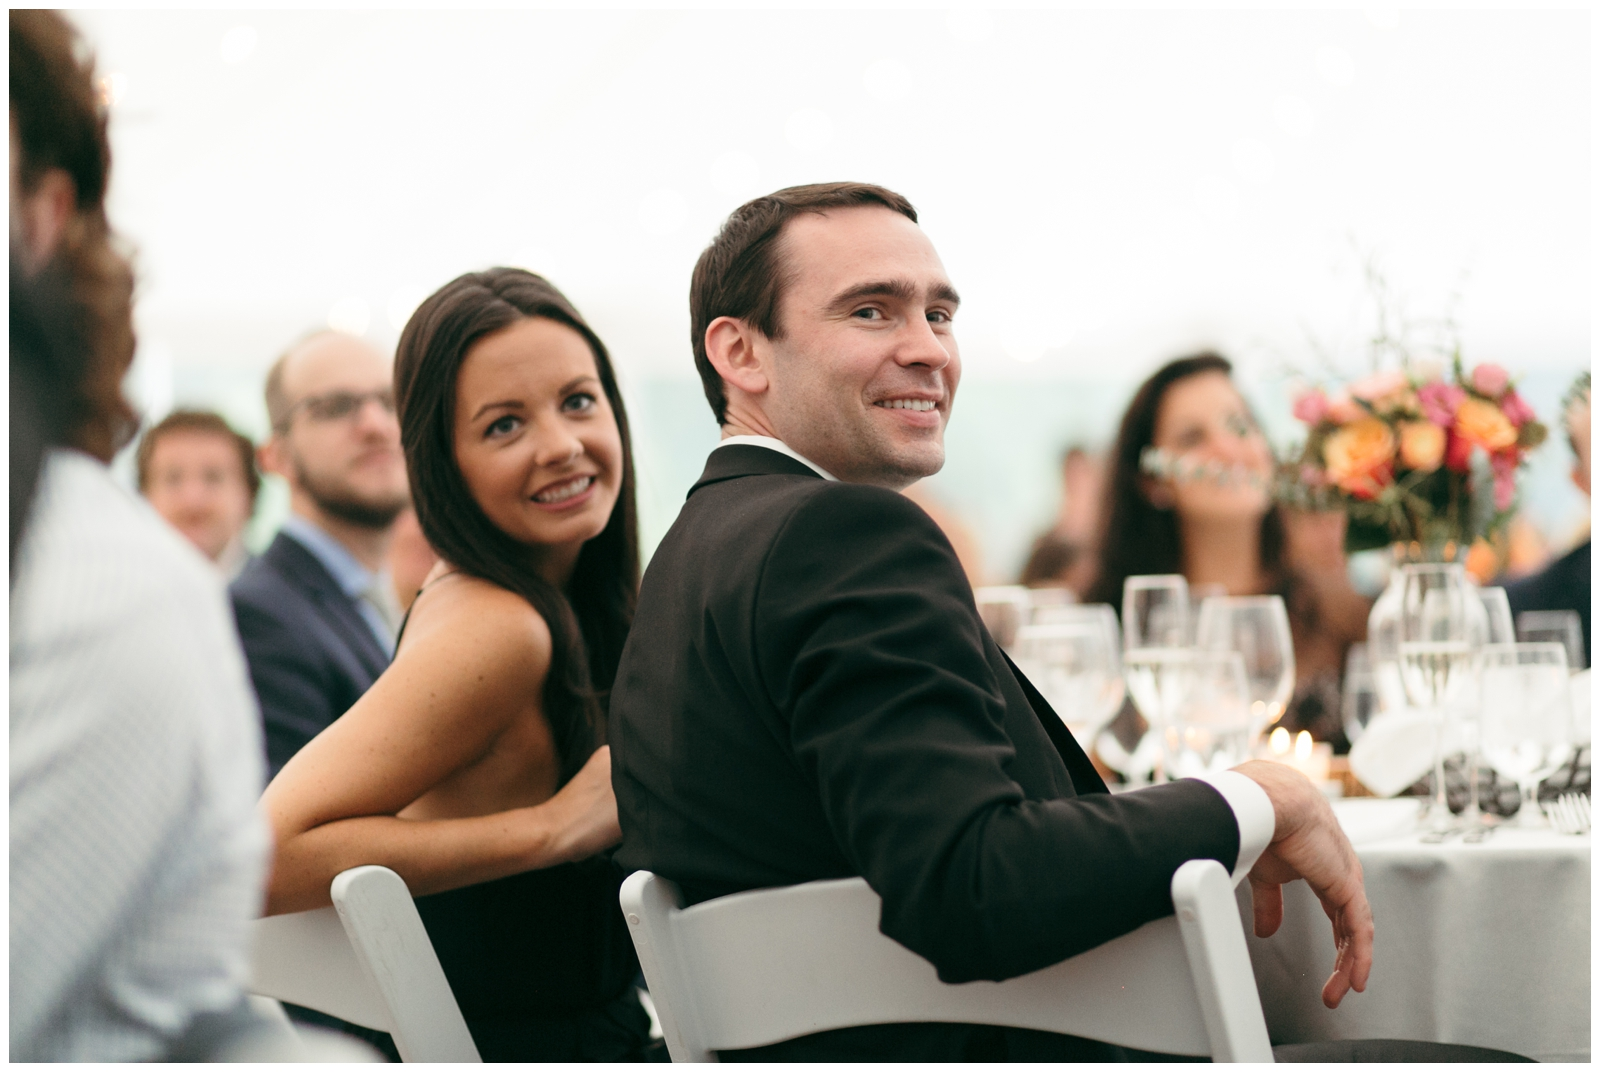 Moraine-Farm-wedding-Bailey-Q-Photo-Massachusetts-wedding-photpgrapher-122.jpg